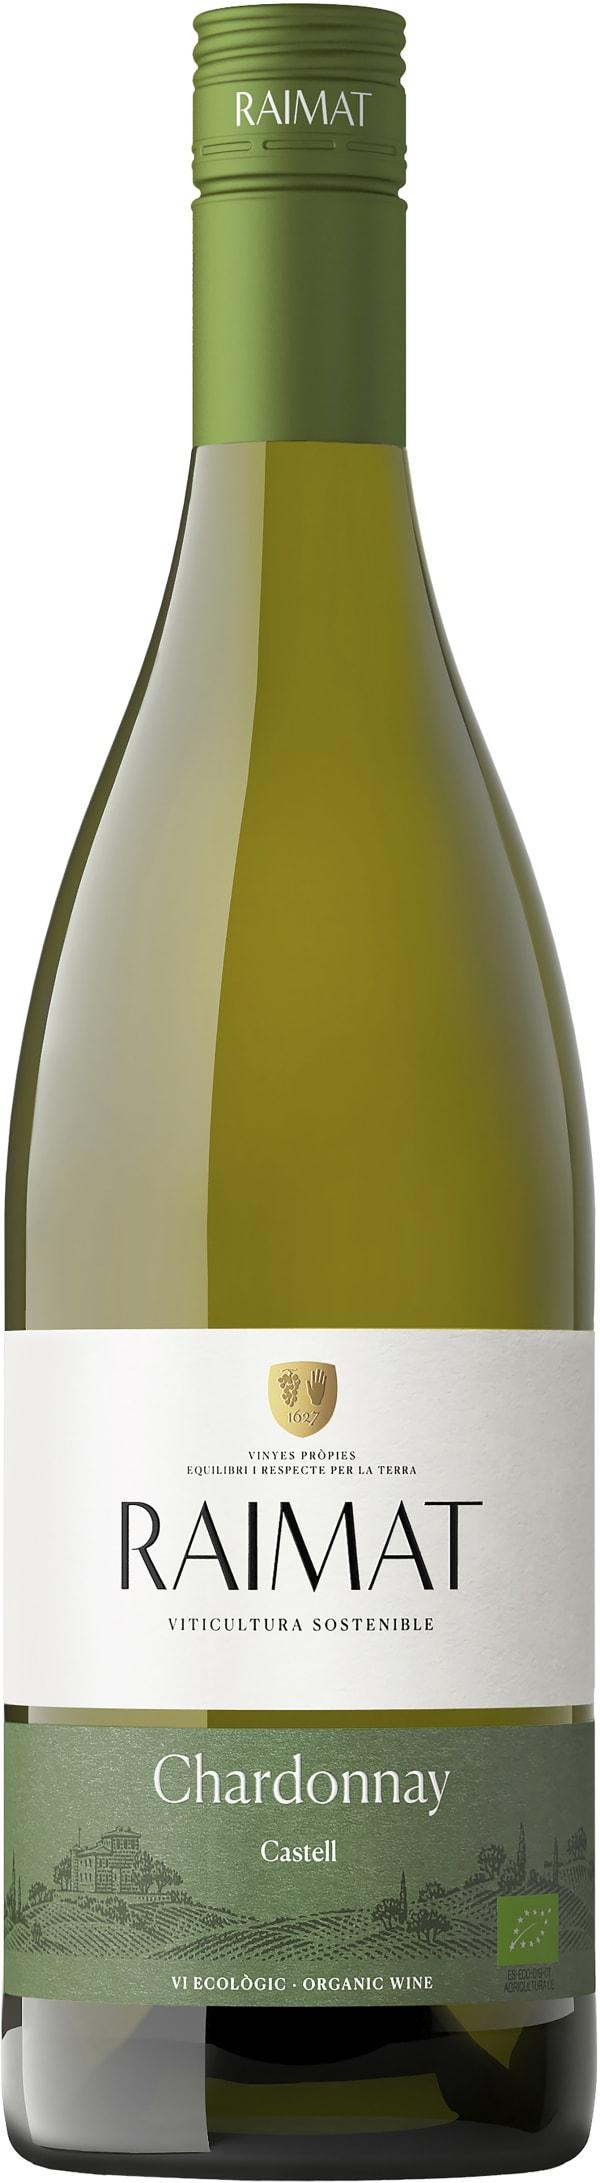 Raimat Castell Chardonnay Organic 2019